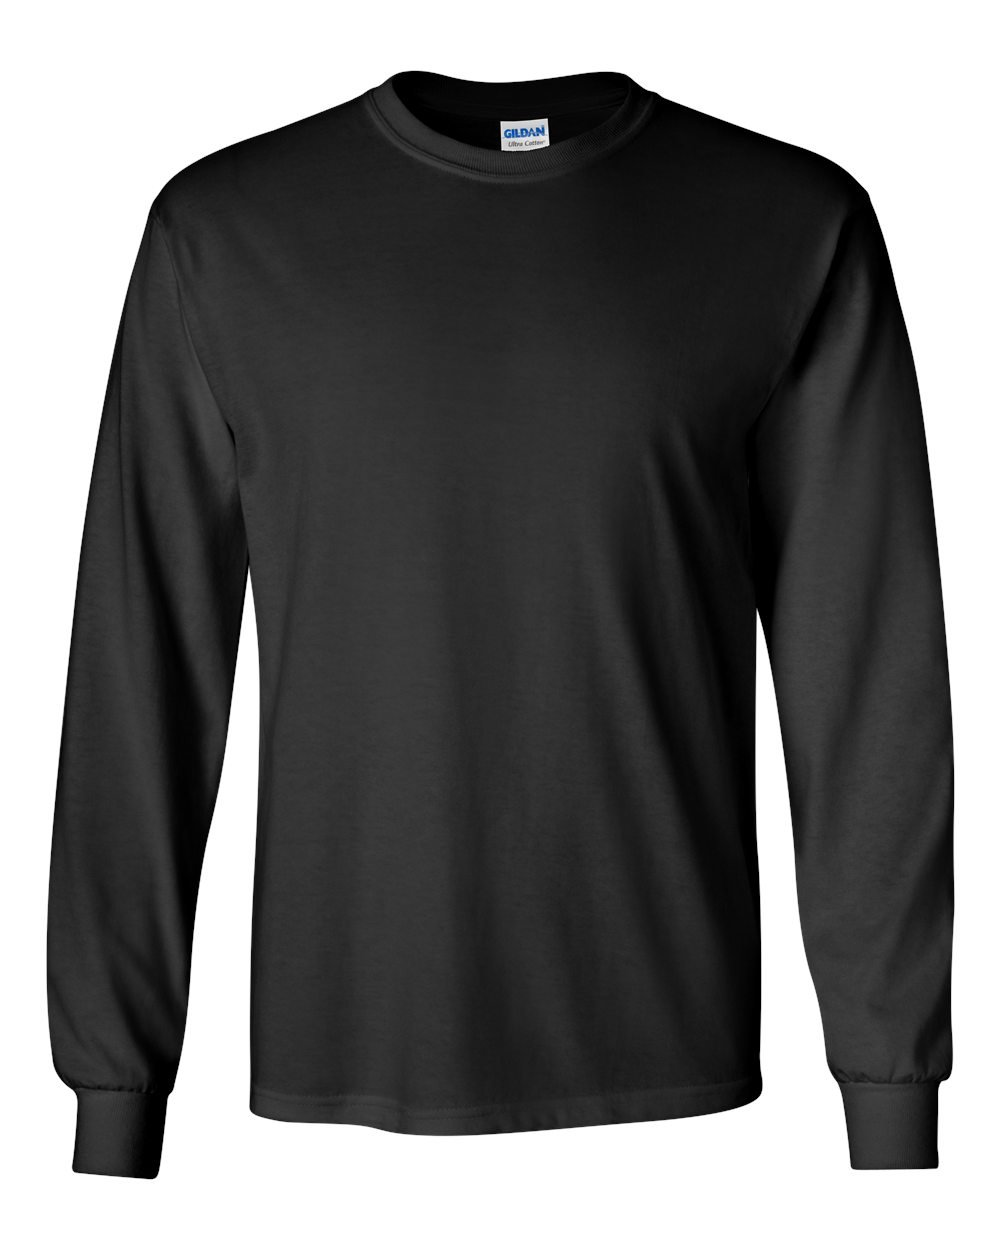 Long Sleeve Shirts - EU Availability